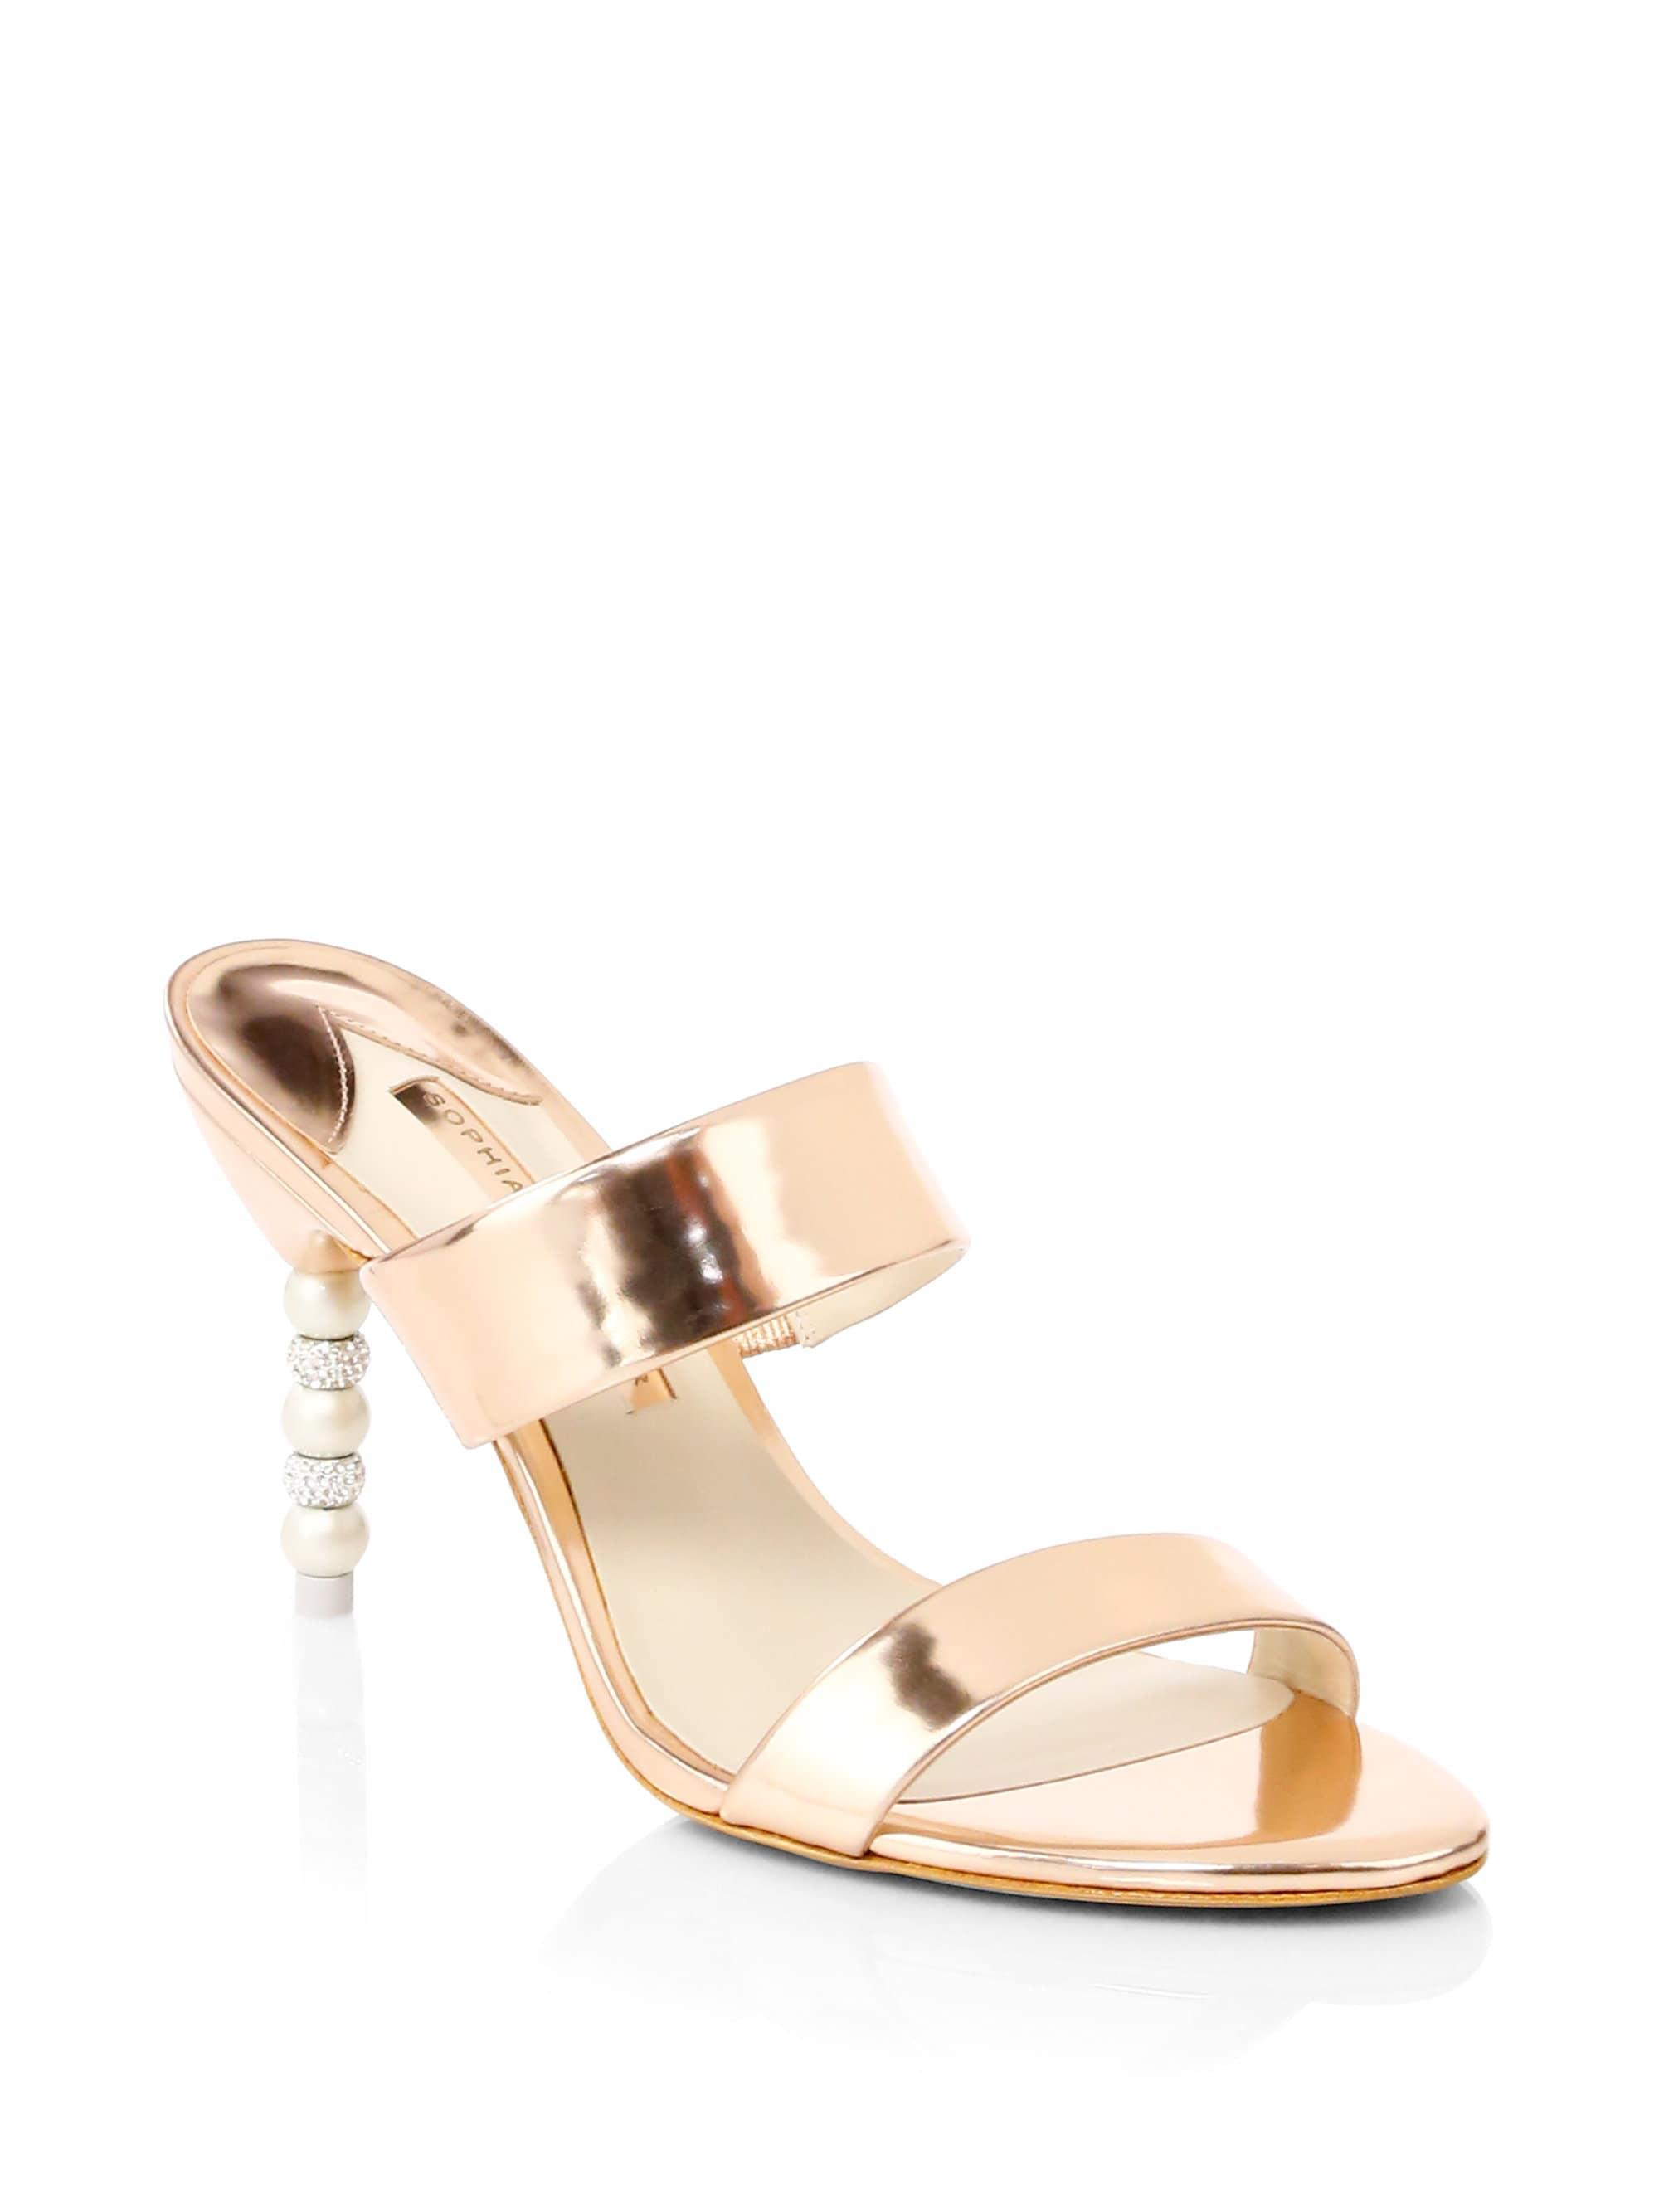 e49b667f7cf Sophia Webster Rosalind Mirror Leather Sandals in Metallic - Lyst